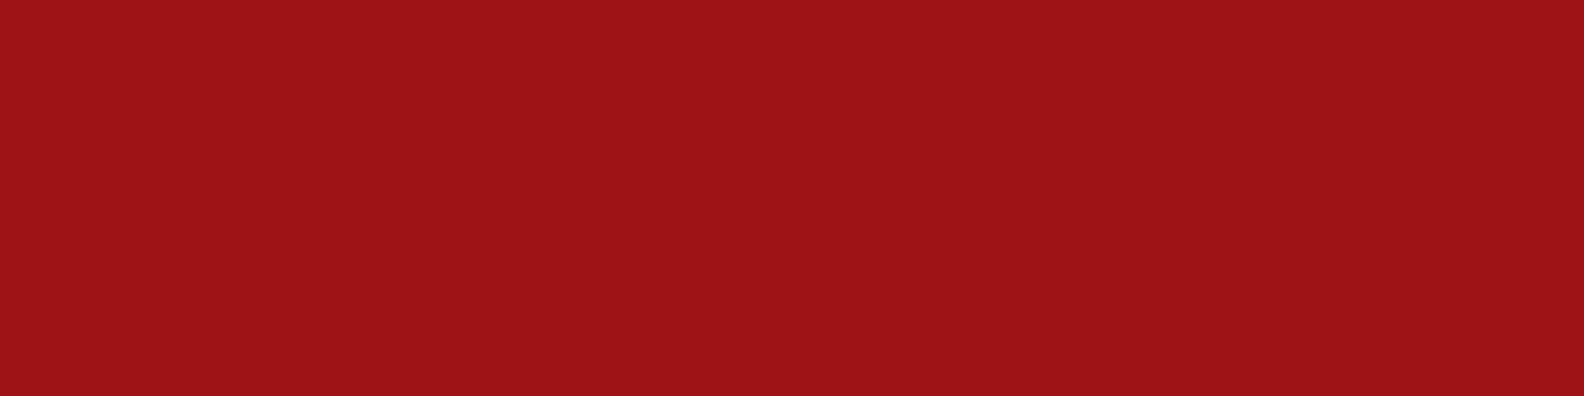 1584x396 Spartan Crimson Solid Color Background